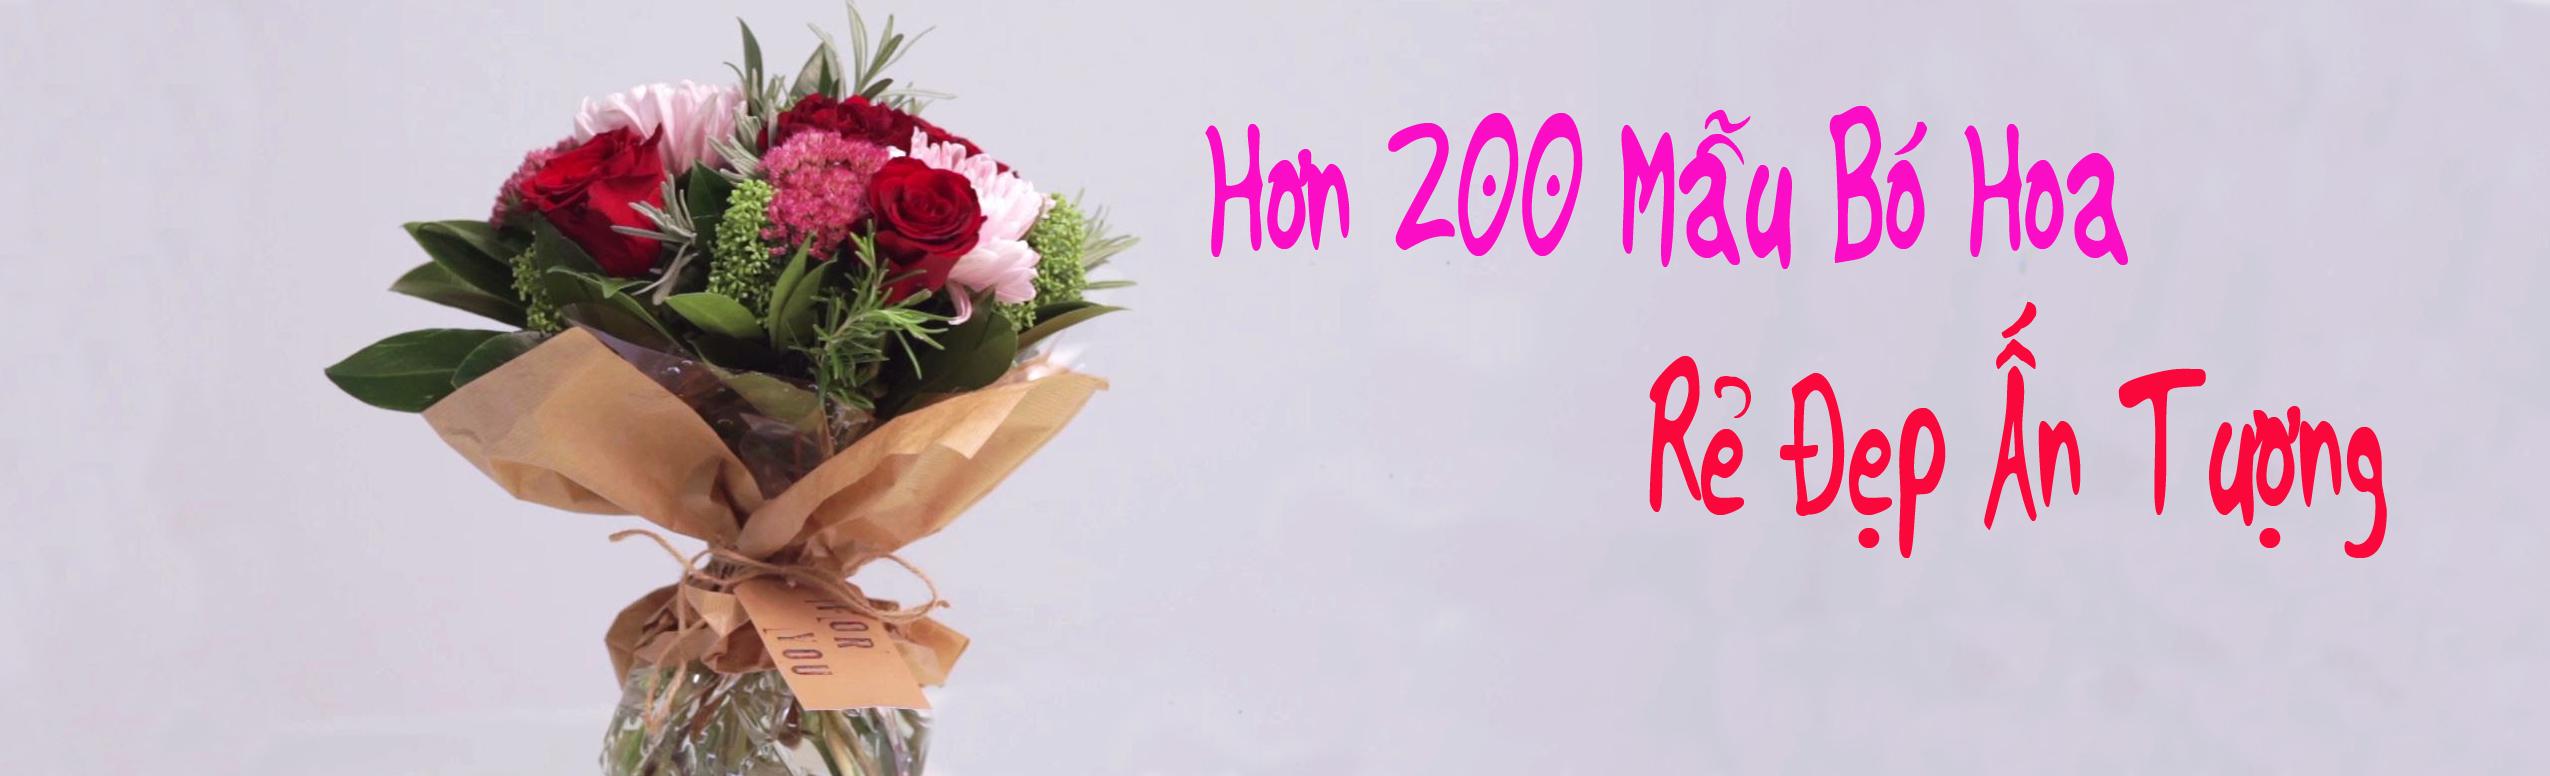 200+ Bó hoa chúc mừng